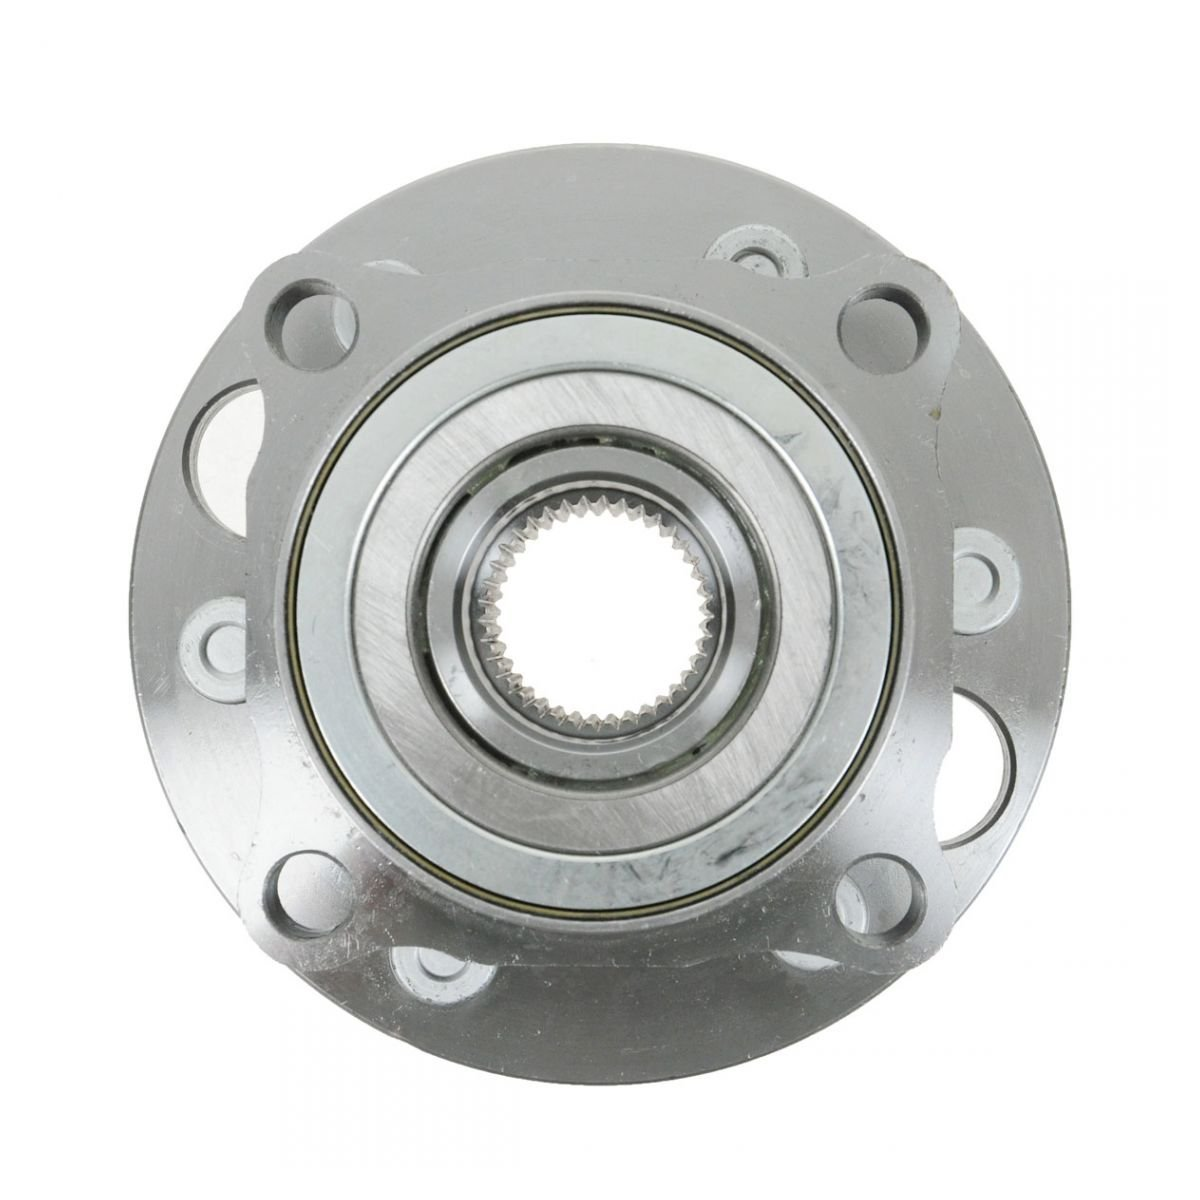 Rear Wheel Hub /& Bearing for 02-05 Chevy GMC Truck 4WS